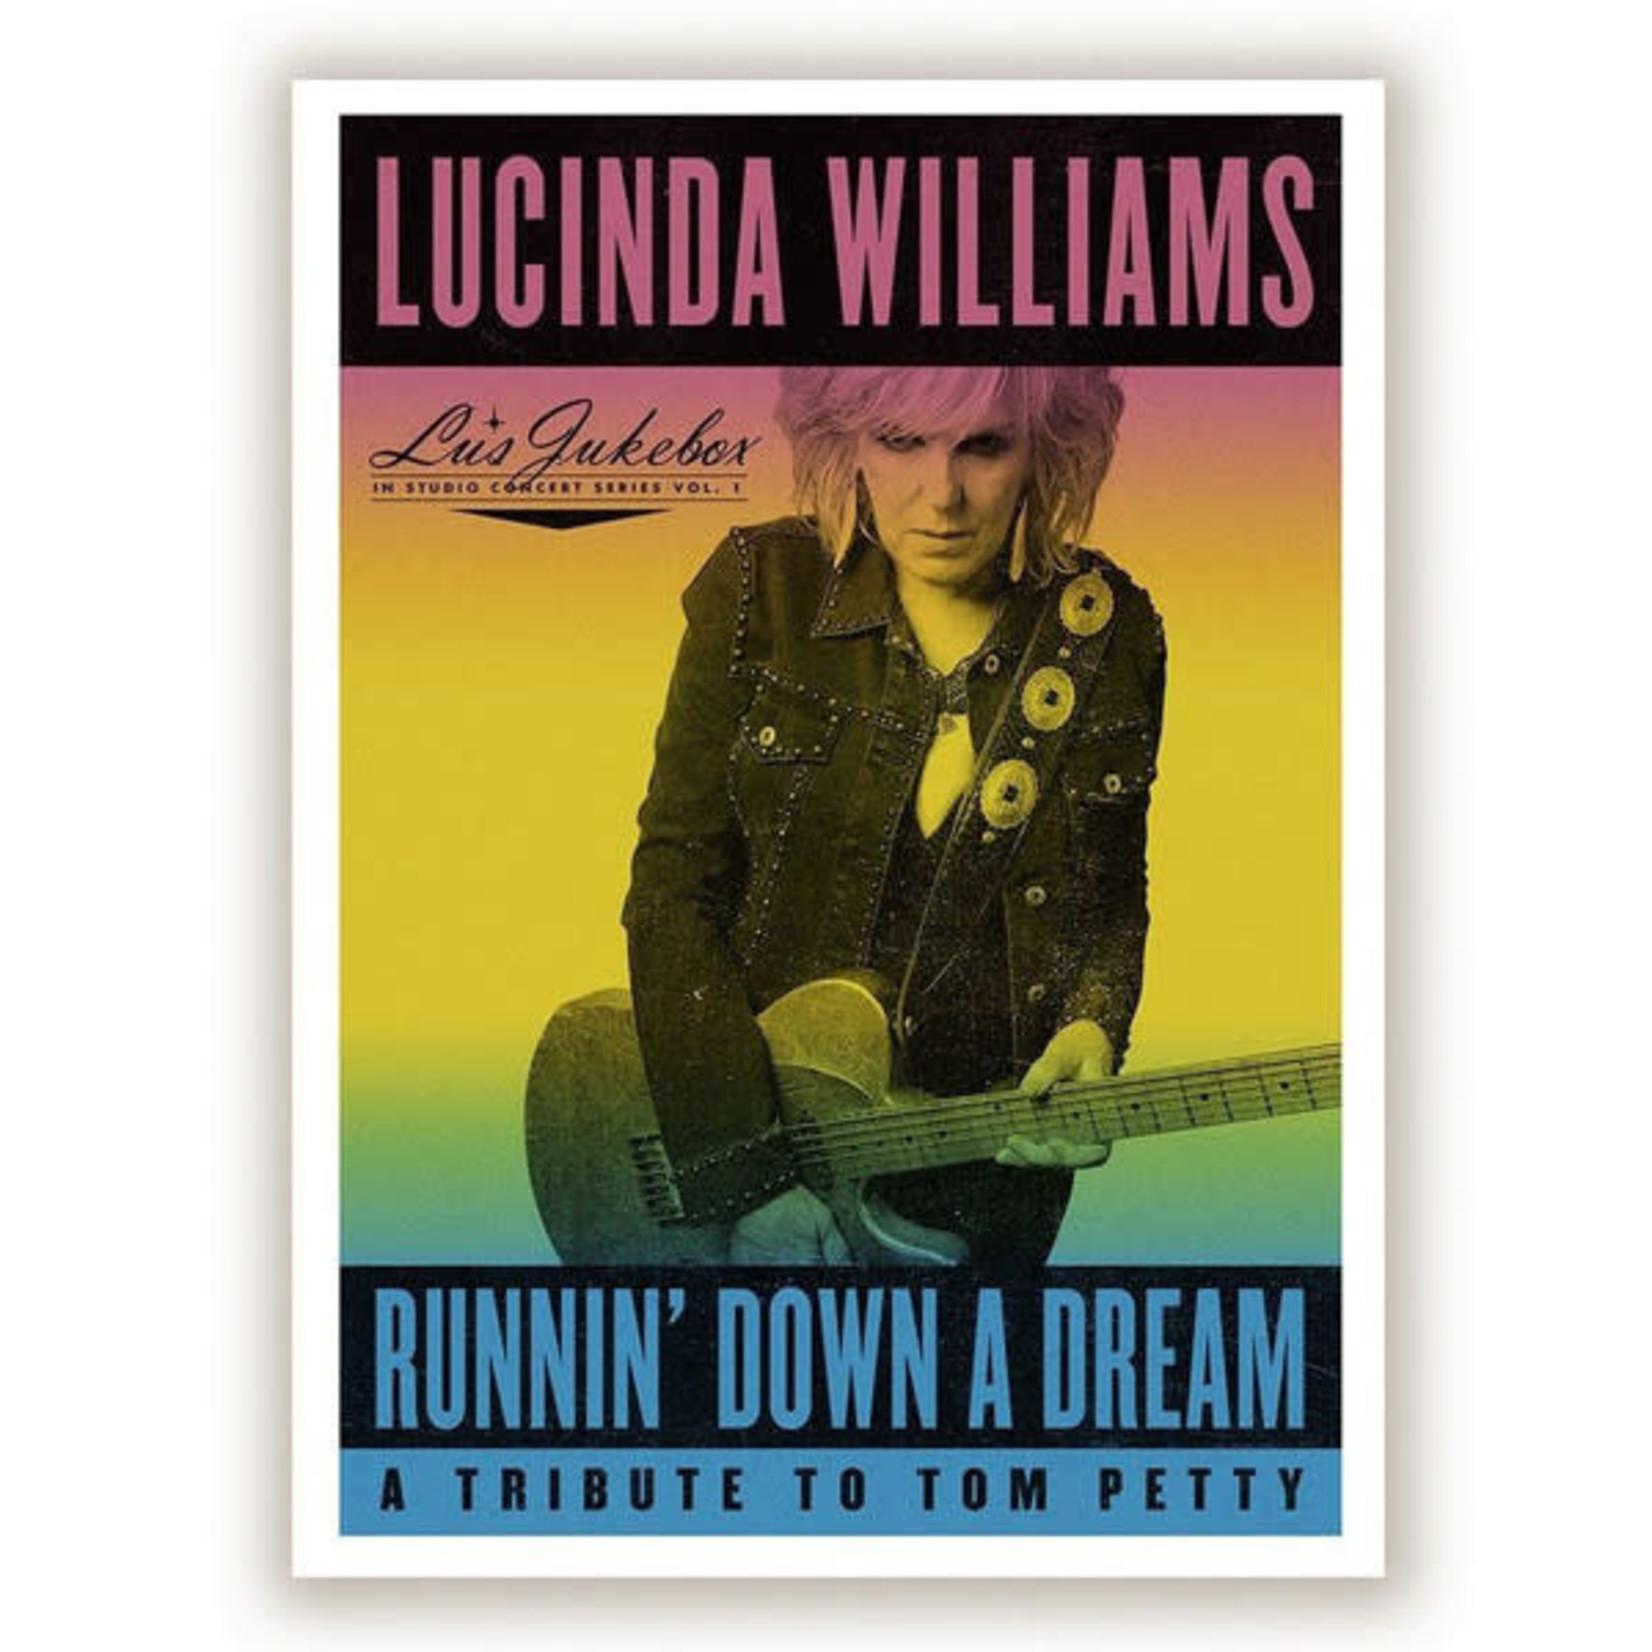 [New] Williams, Lucinda: Runnin' Down A Dream: A Tribute To Tom Petty